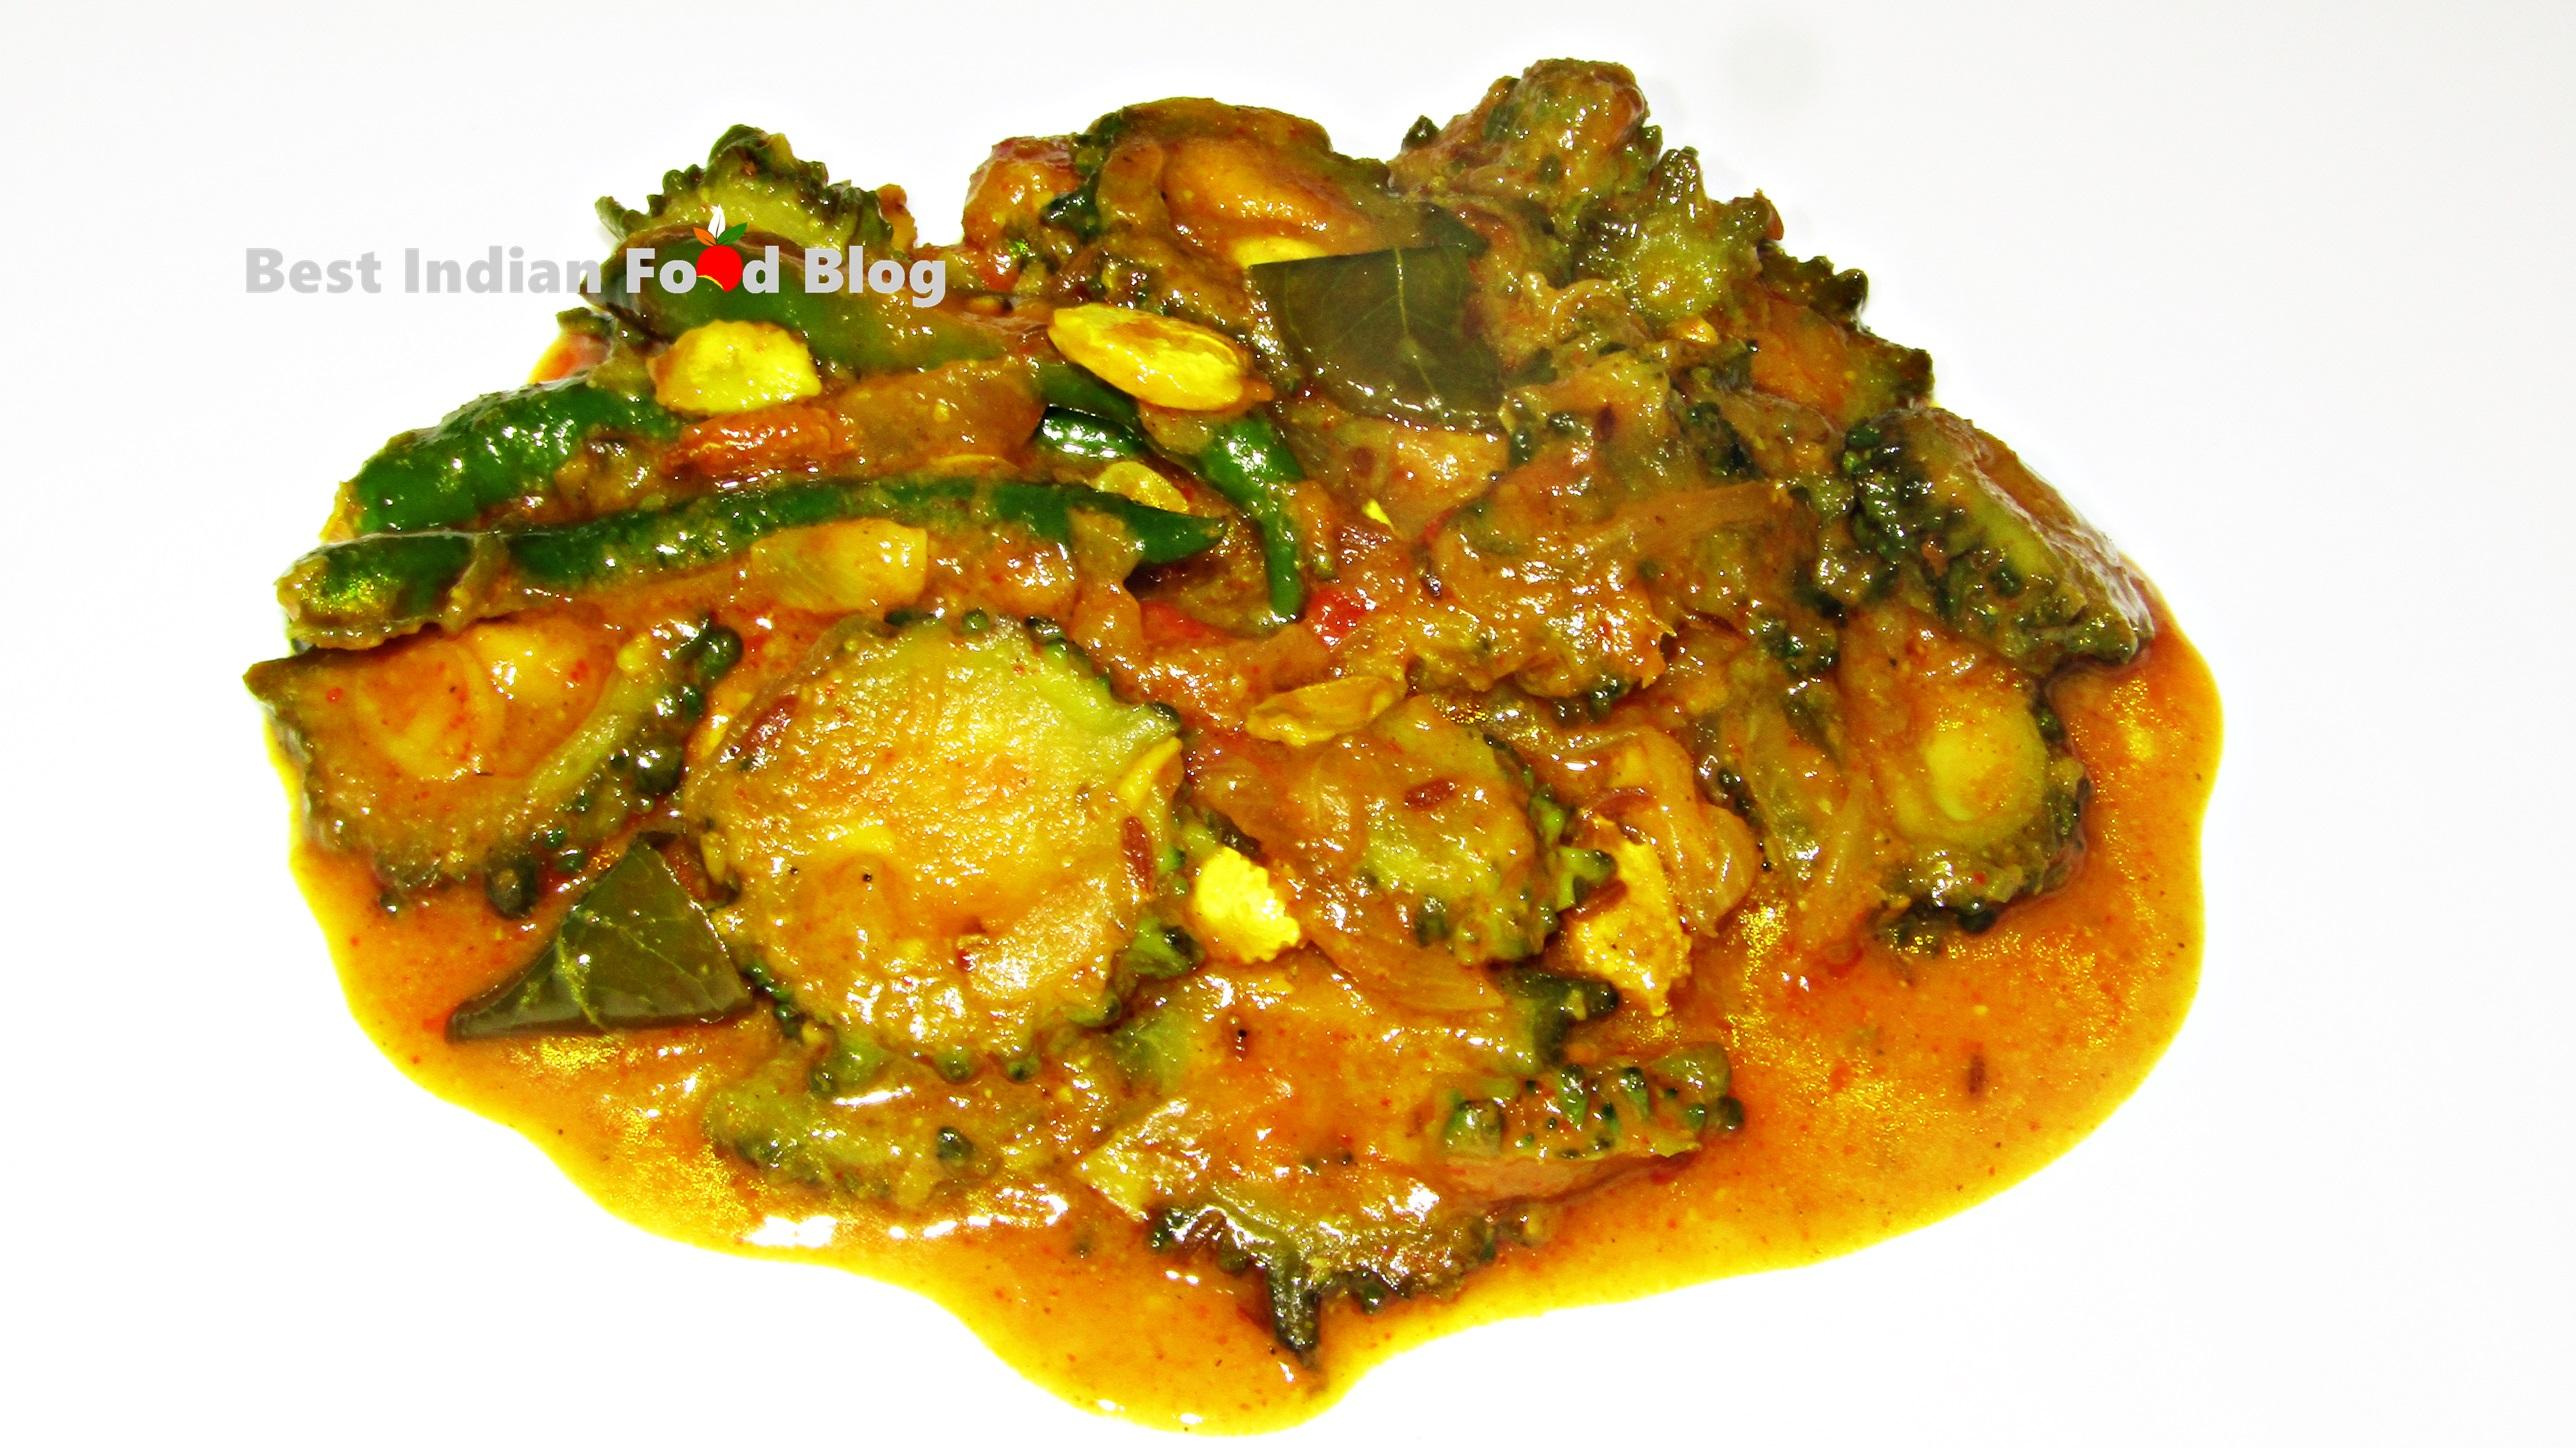 Kakarakaya Pulusu from Telangana, India | Best Indian Food Blog | Bitter melon recipe